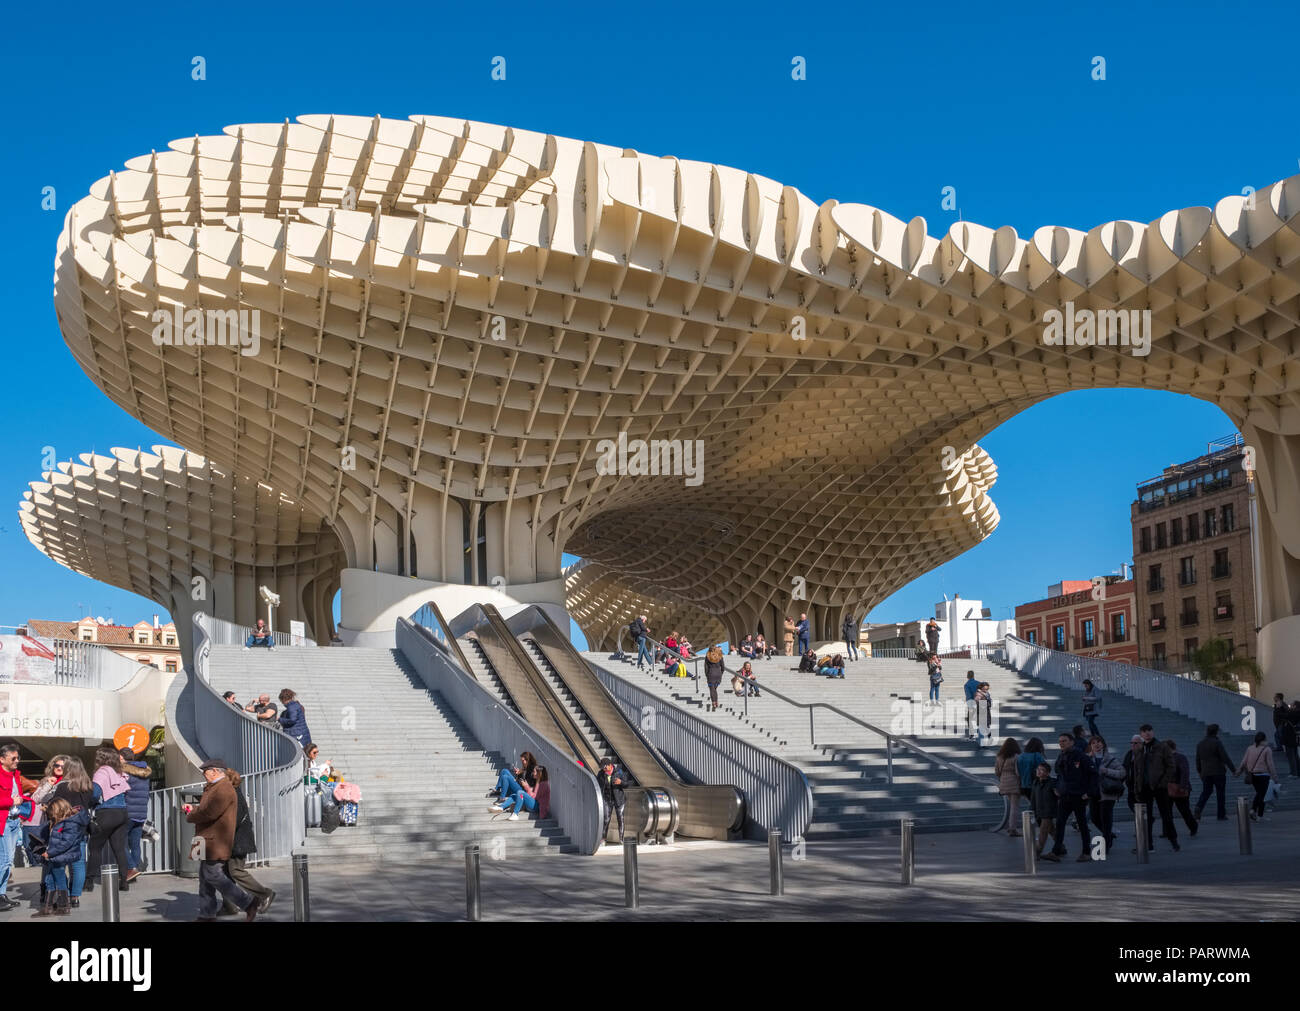 Metropol Parasol, Espacio Metropol Parasol, Incarnation Square, Plaza de la Encarnation, Seville, Spain, Europe - modern architecture - Stock Image